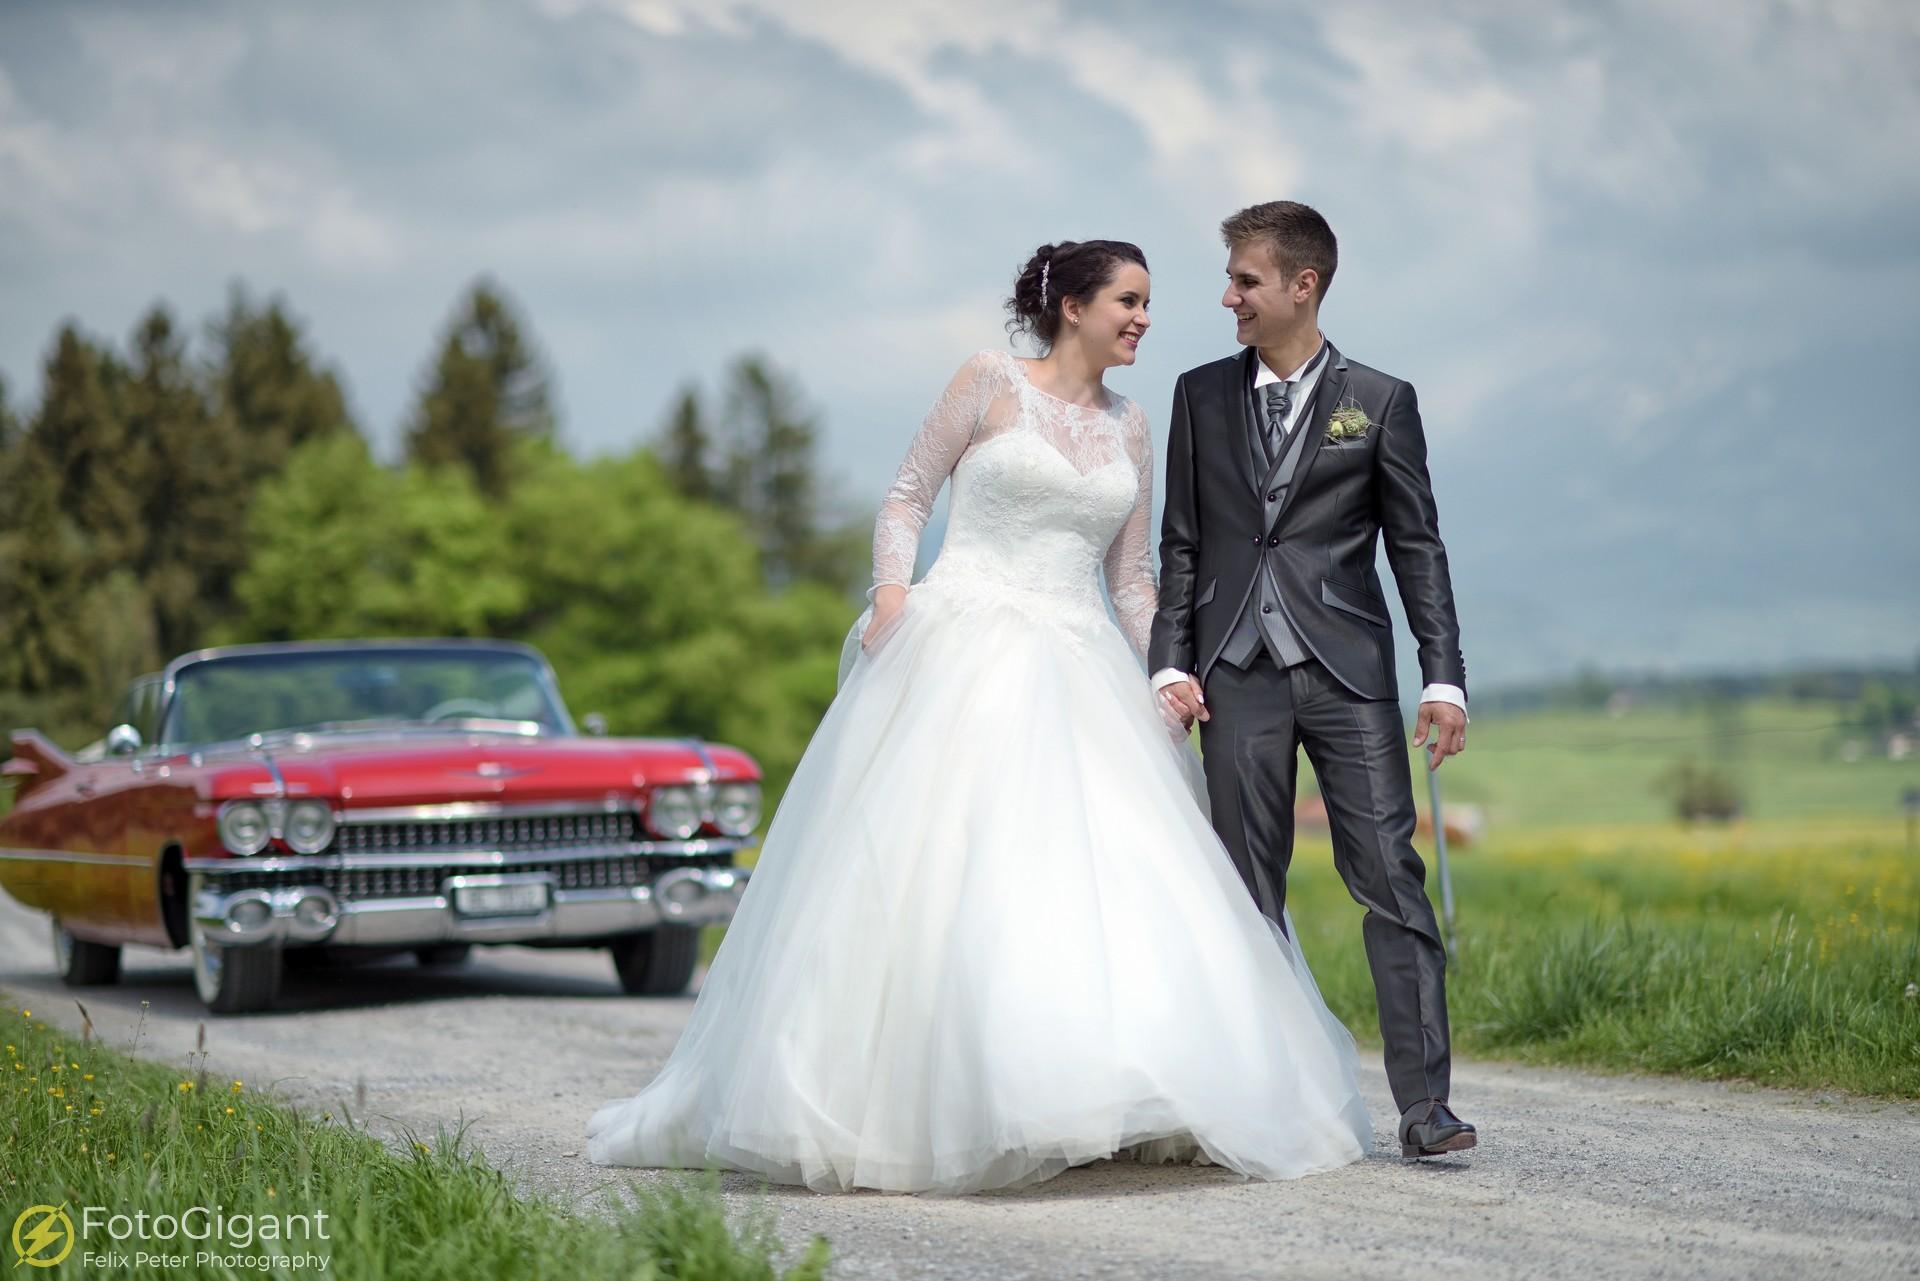 Hochzeitsfotograf_Bern_7.jpg